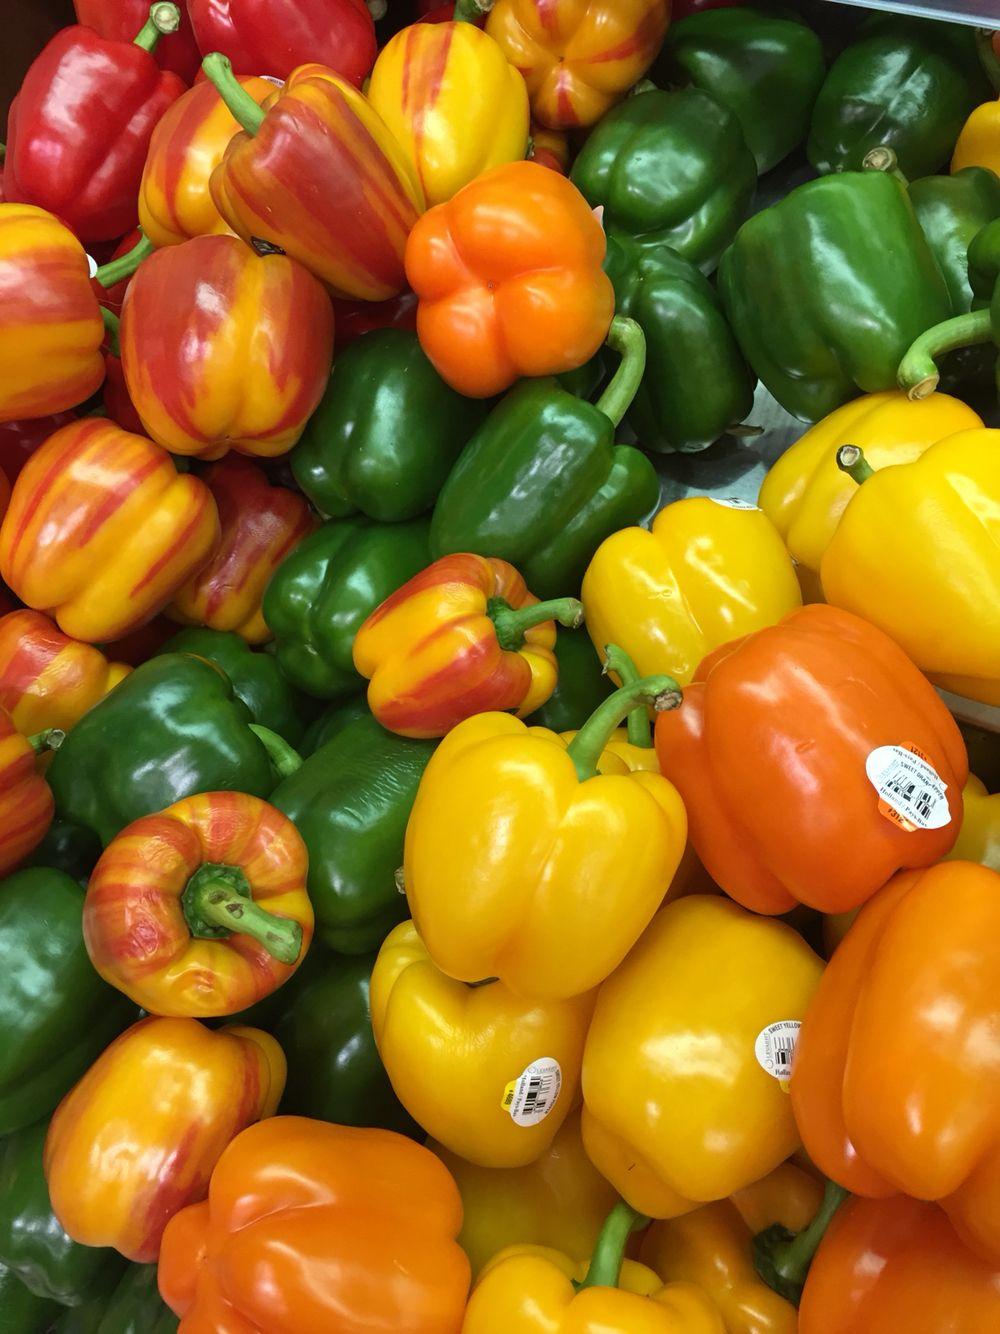 Lovely peppers!! #dubaimall #supermarket #strollingaround 😄